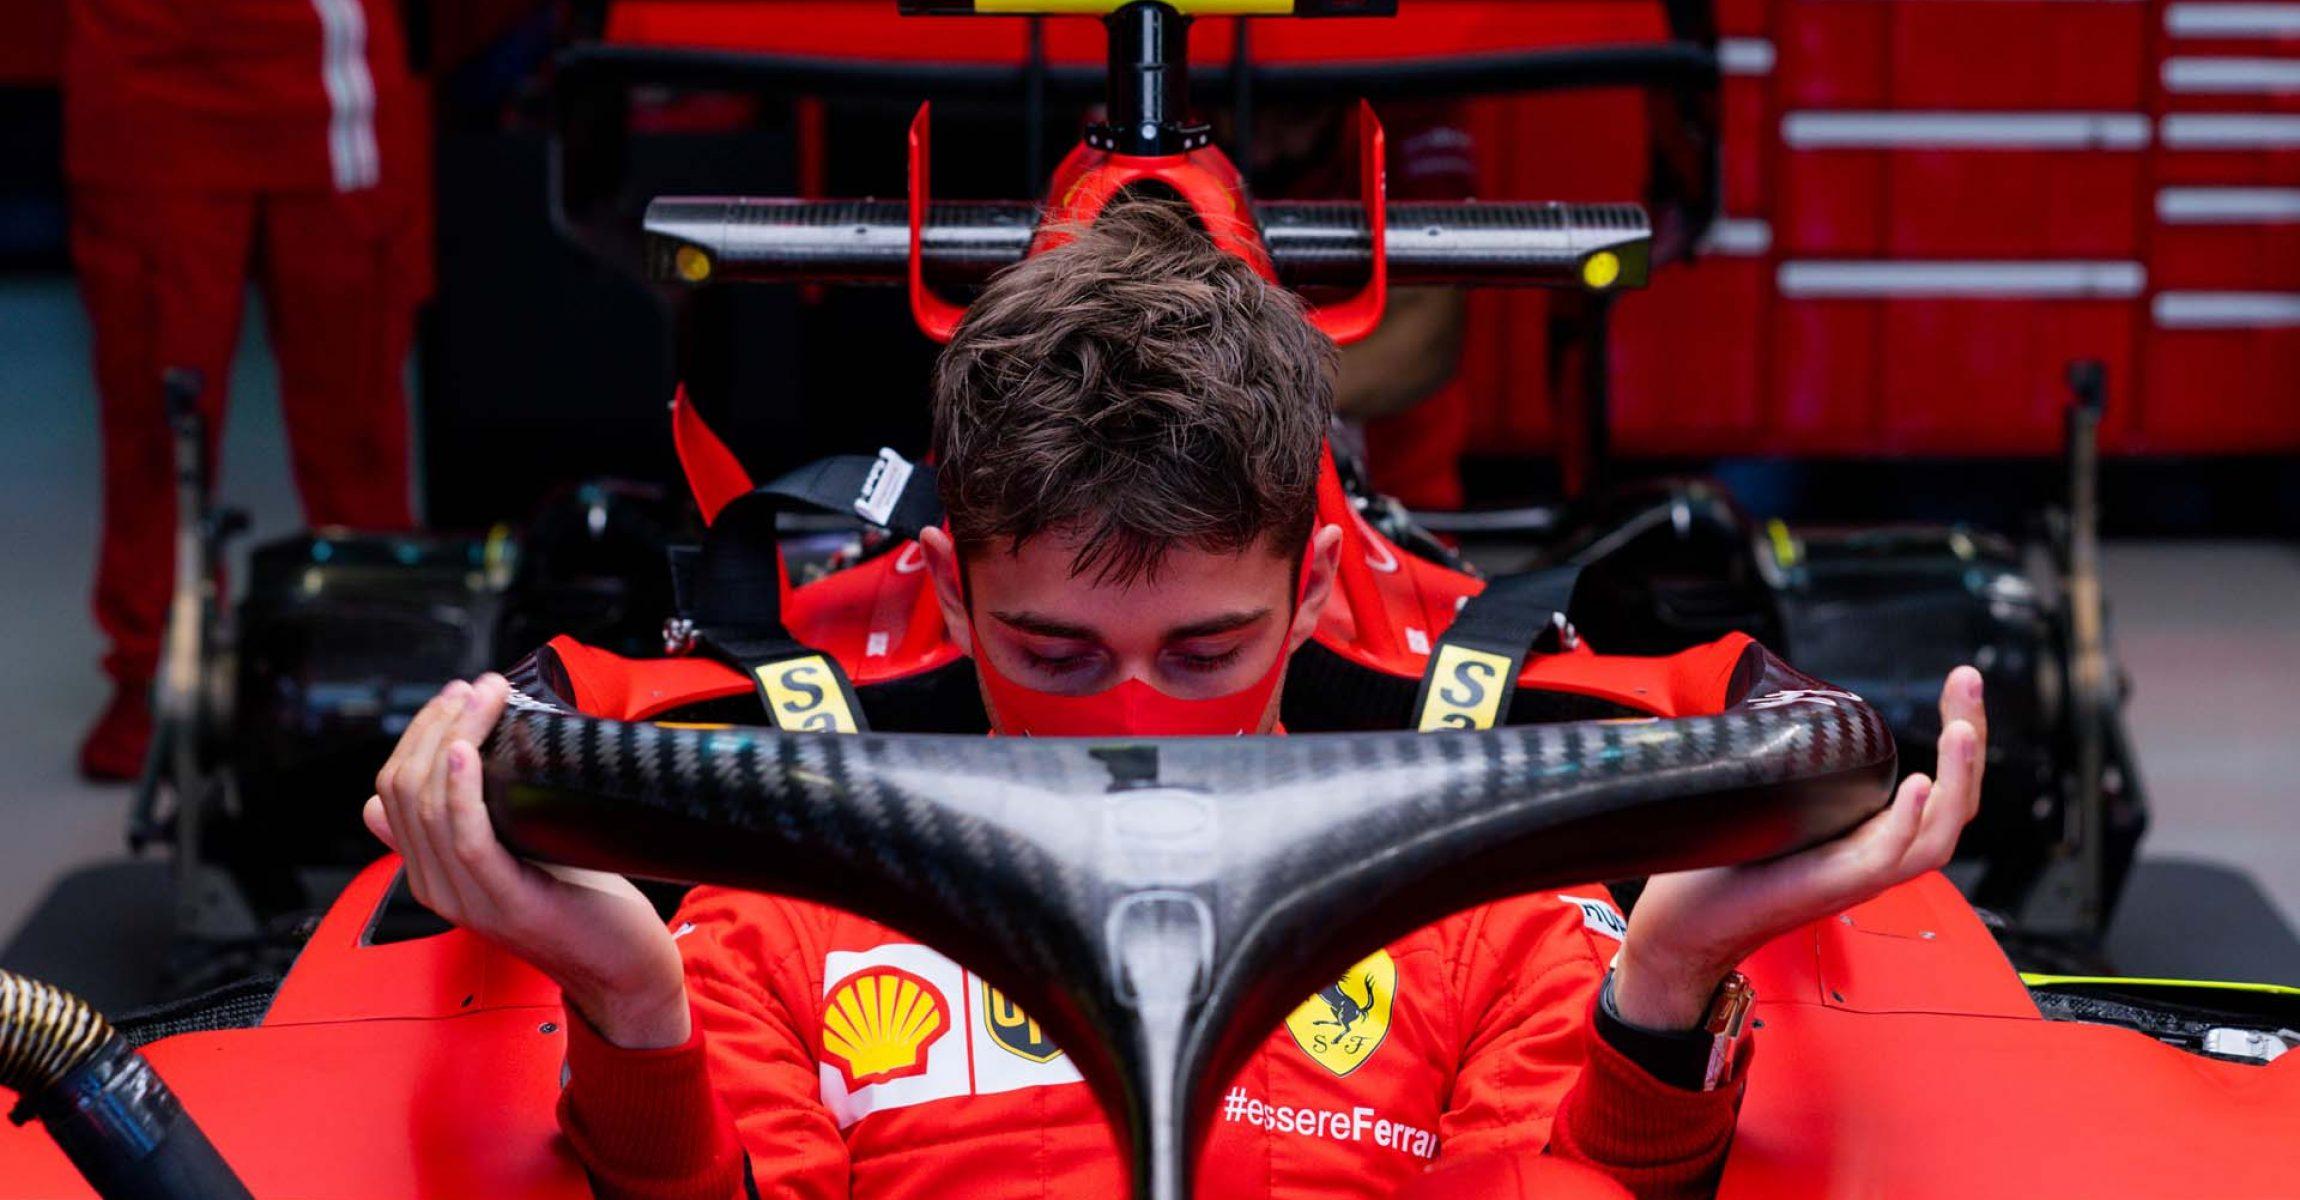 GP RUSSIA F1/2020 -  GIOVEDÌ 24/09/2020       credit: @Scuderia Ferrari Press Office Charles Leclerc